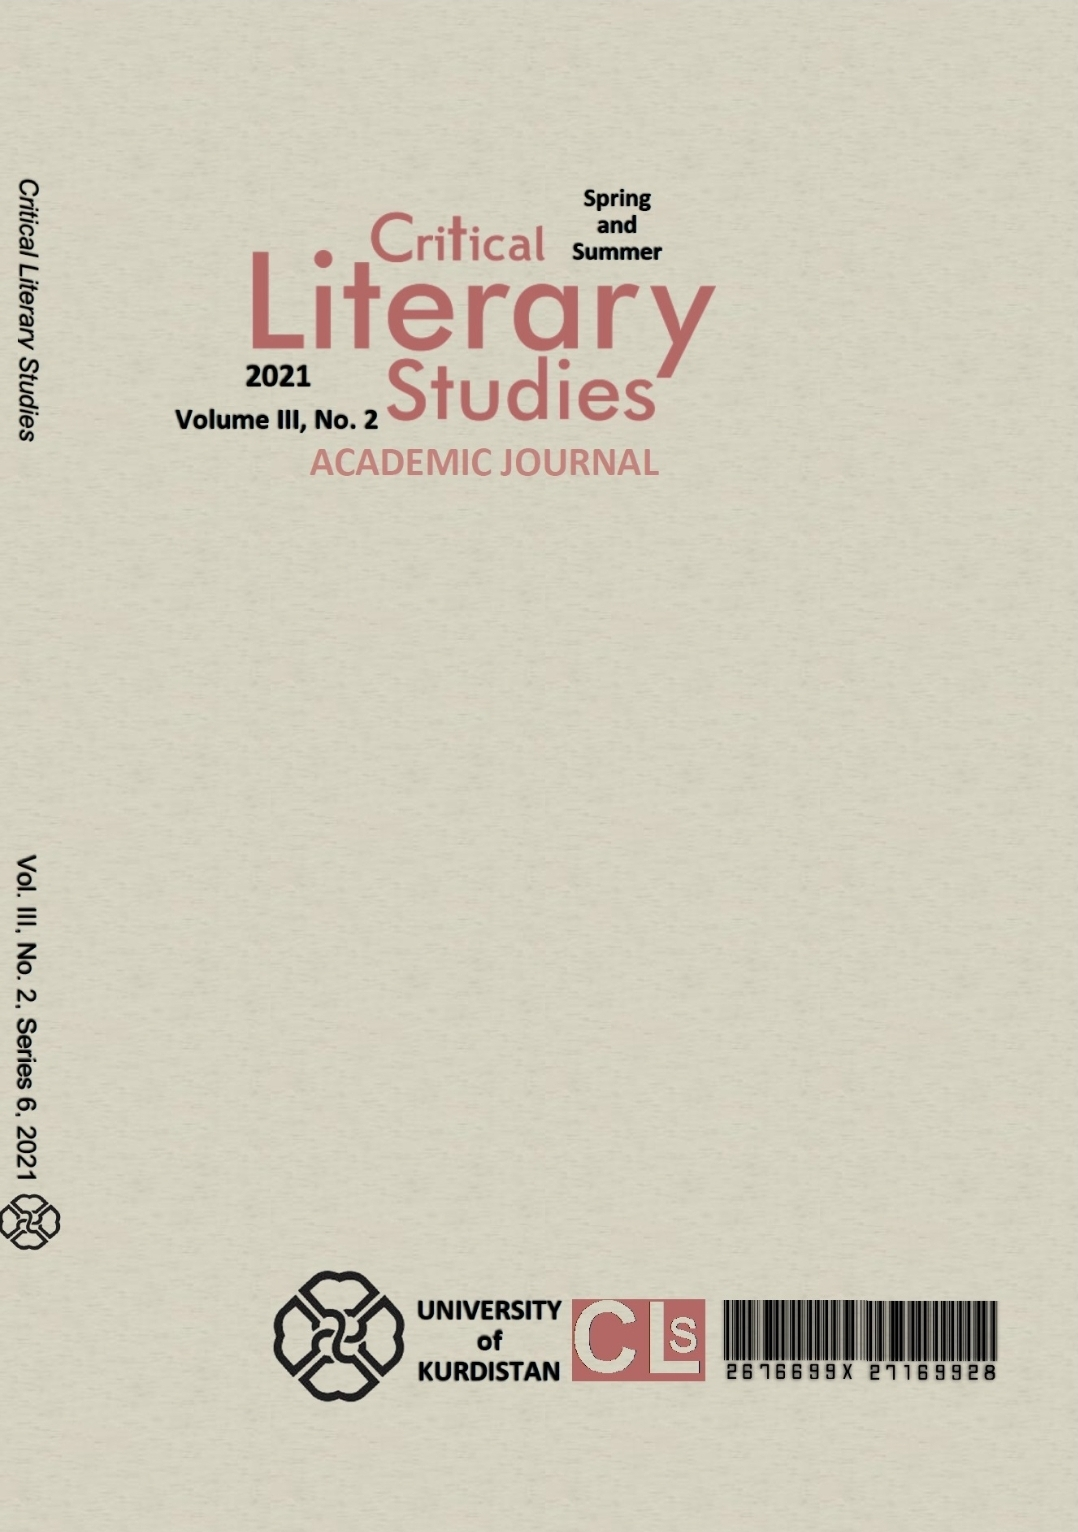 Critical Literary Studies